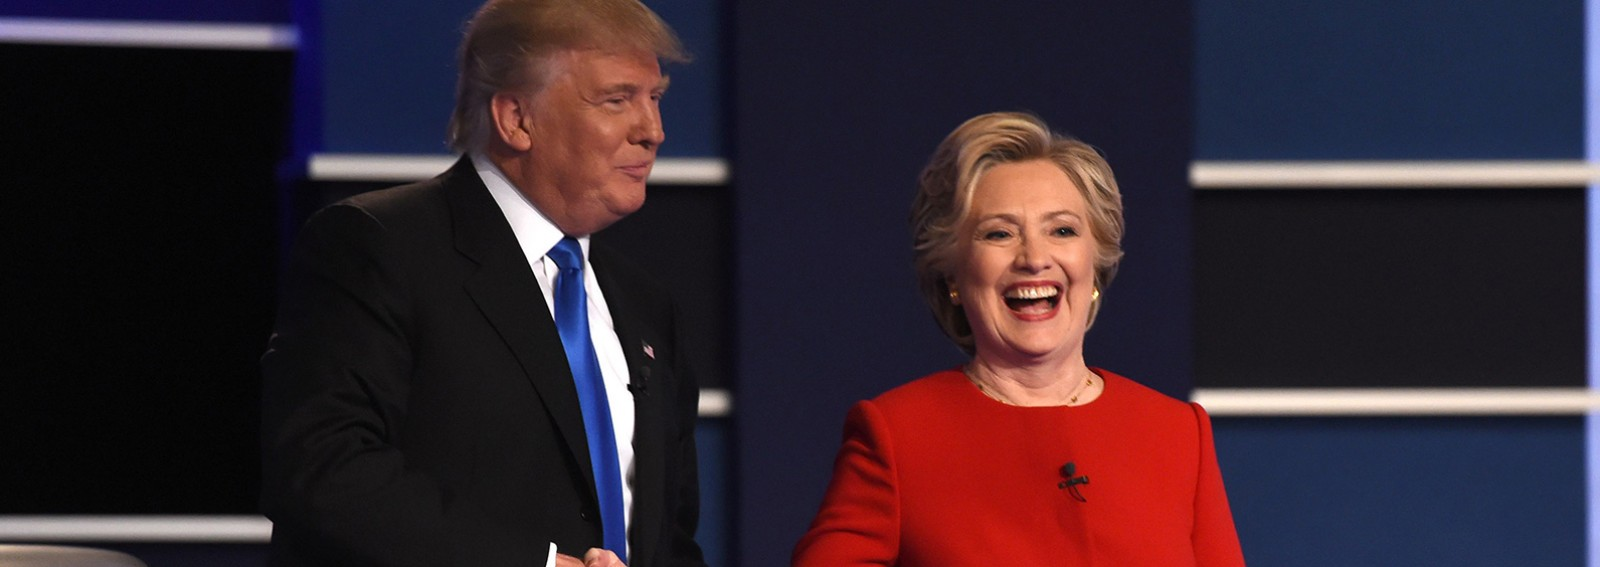 Watch the heated Clinton-Trump debate in 3 minutes